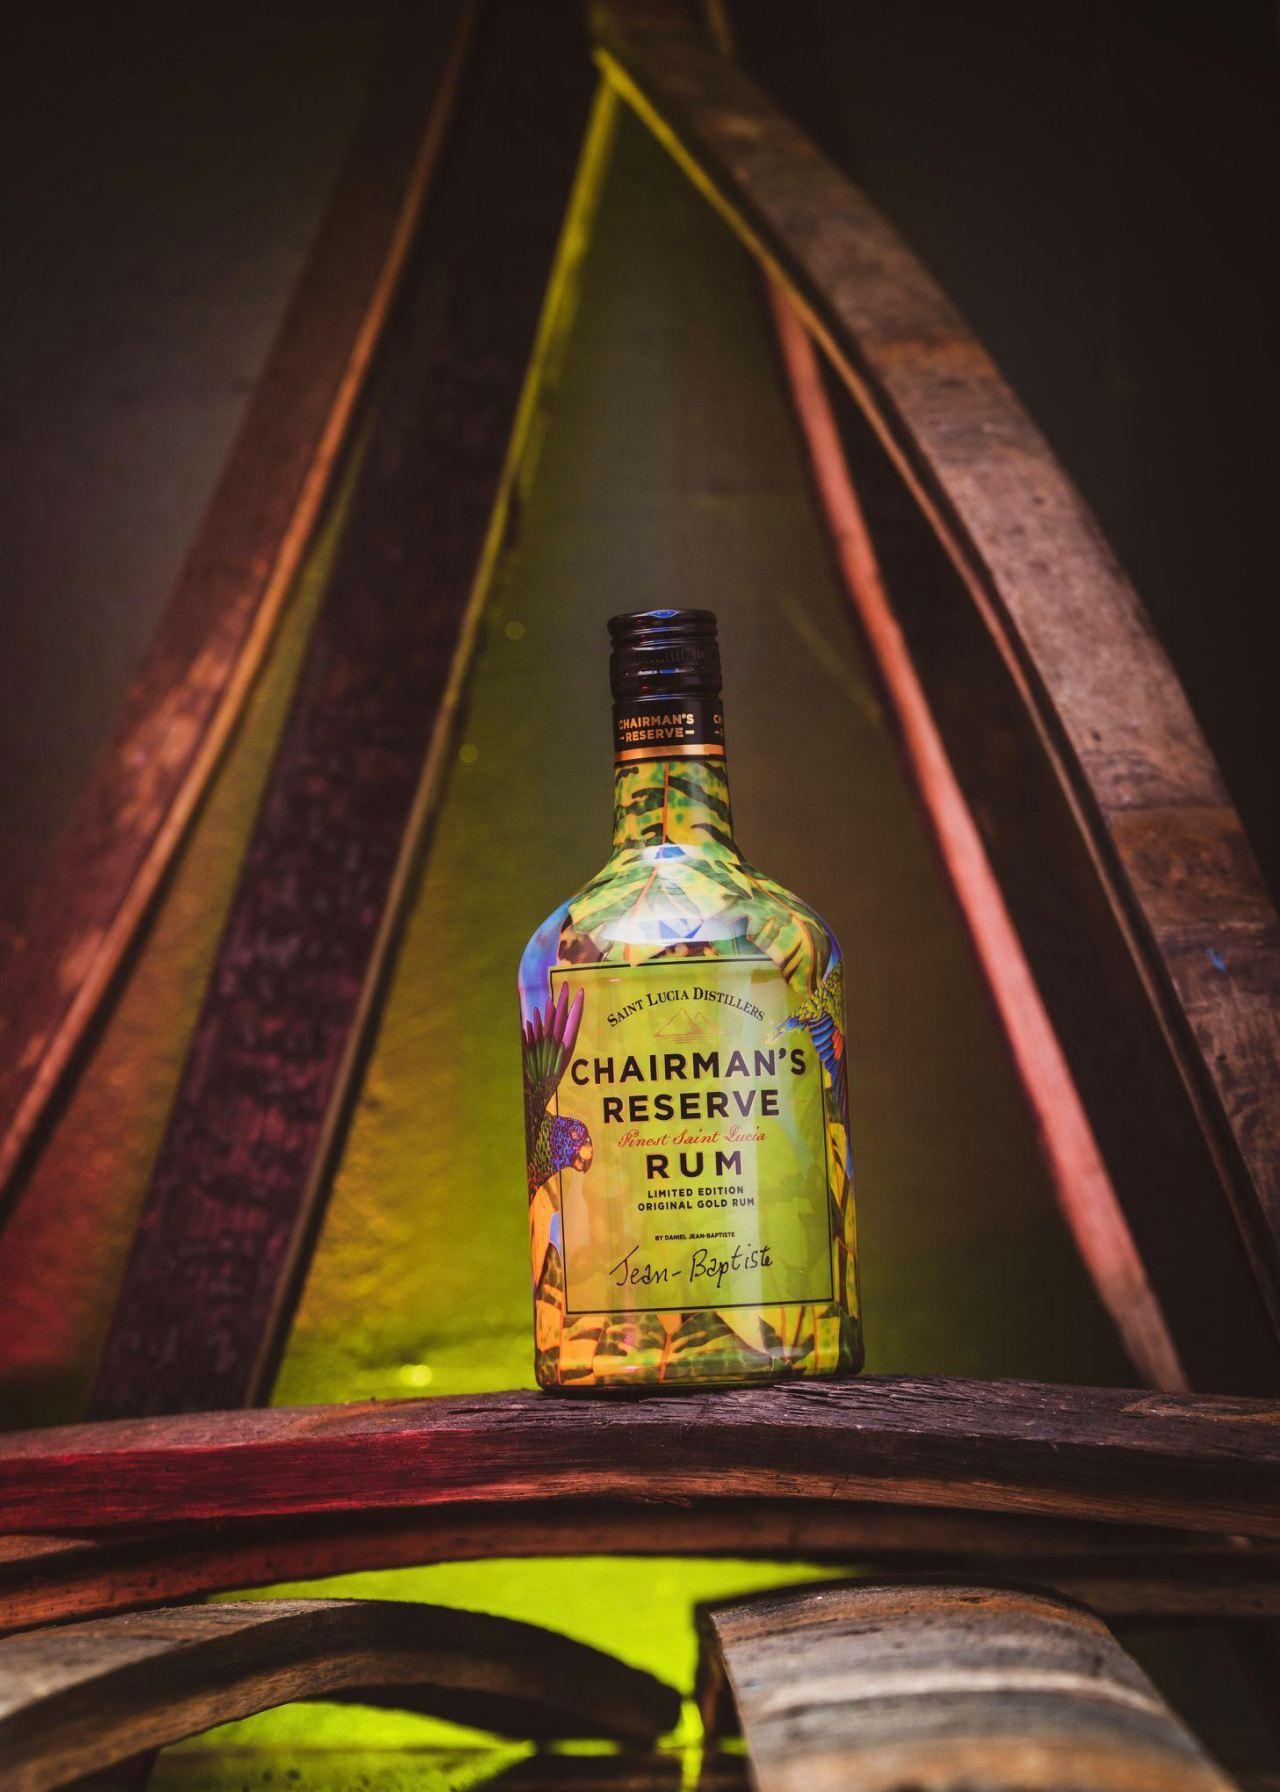 Chairman's Reserve Rum Eco Series